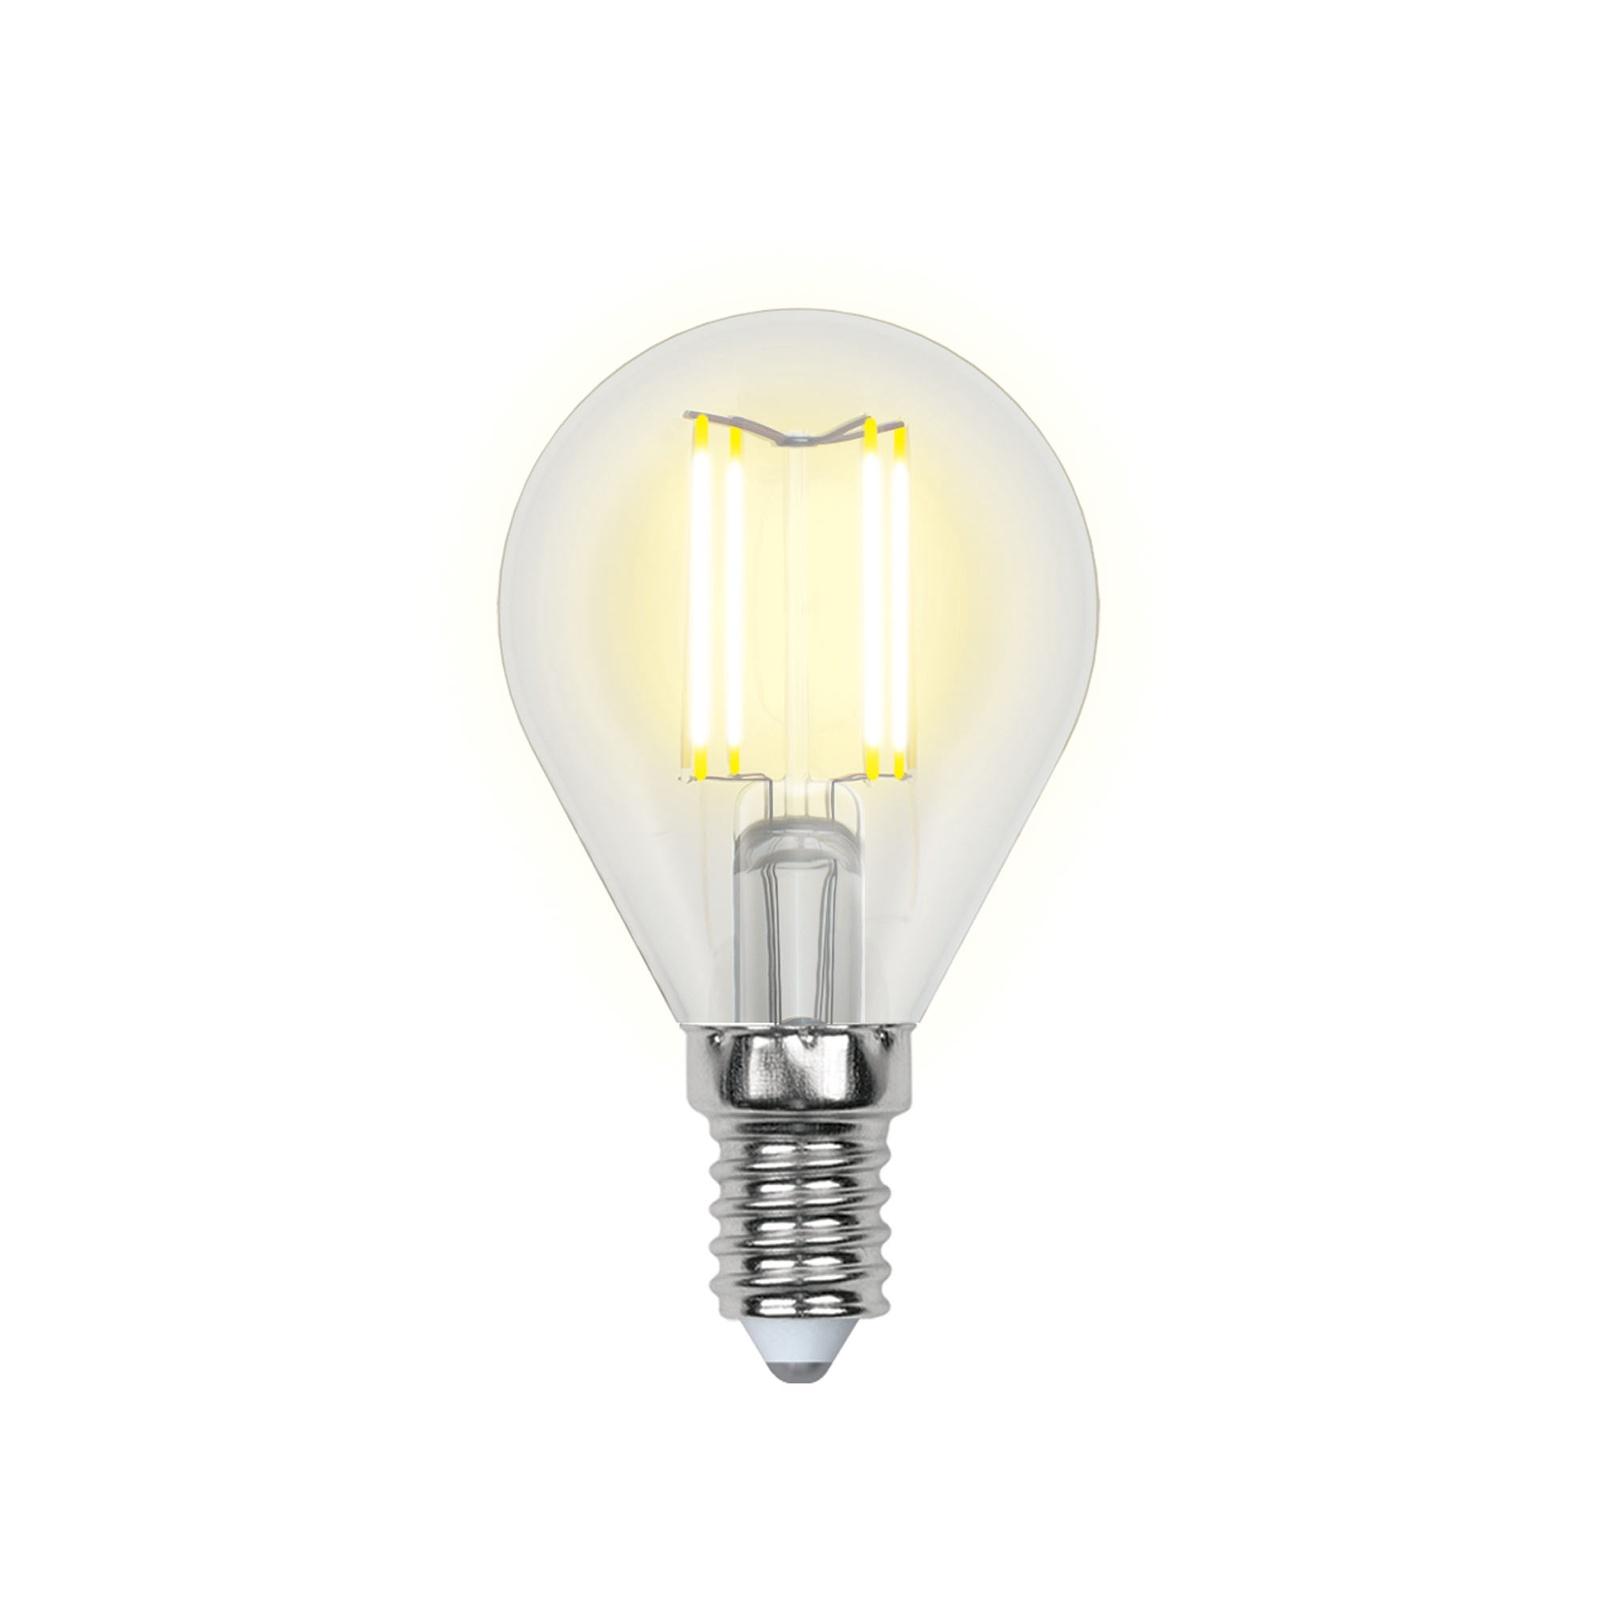 Лампочка Uniel LED-G45-6W/WW/E14/CL 3000K, Теплый свет 6 Вт, Светодиодная